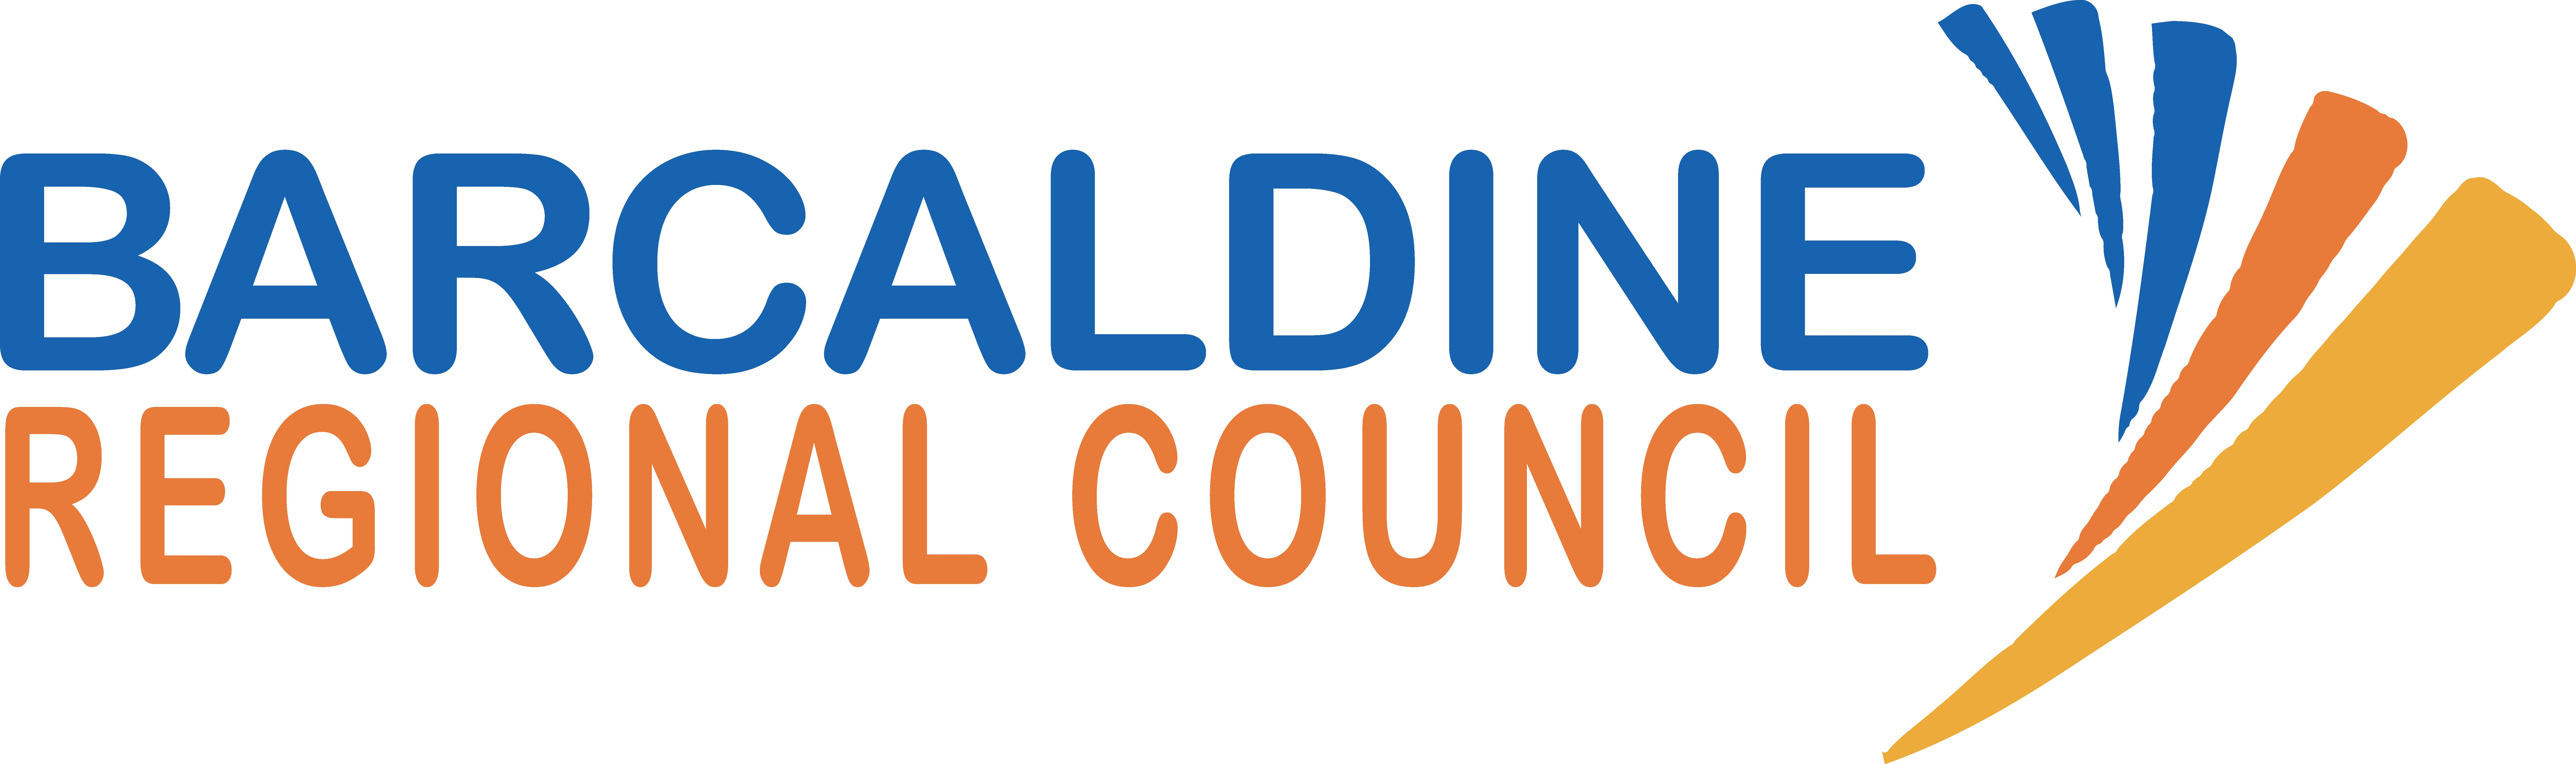 Barcaldine Regional Council